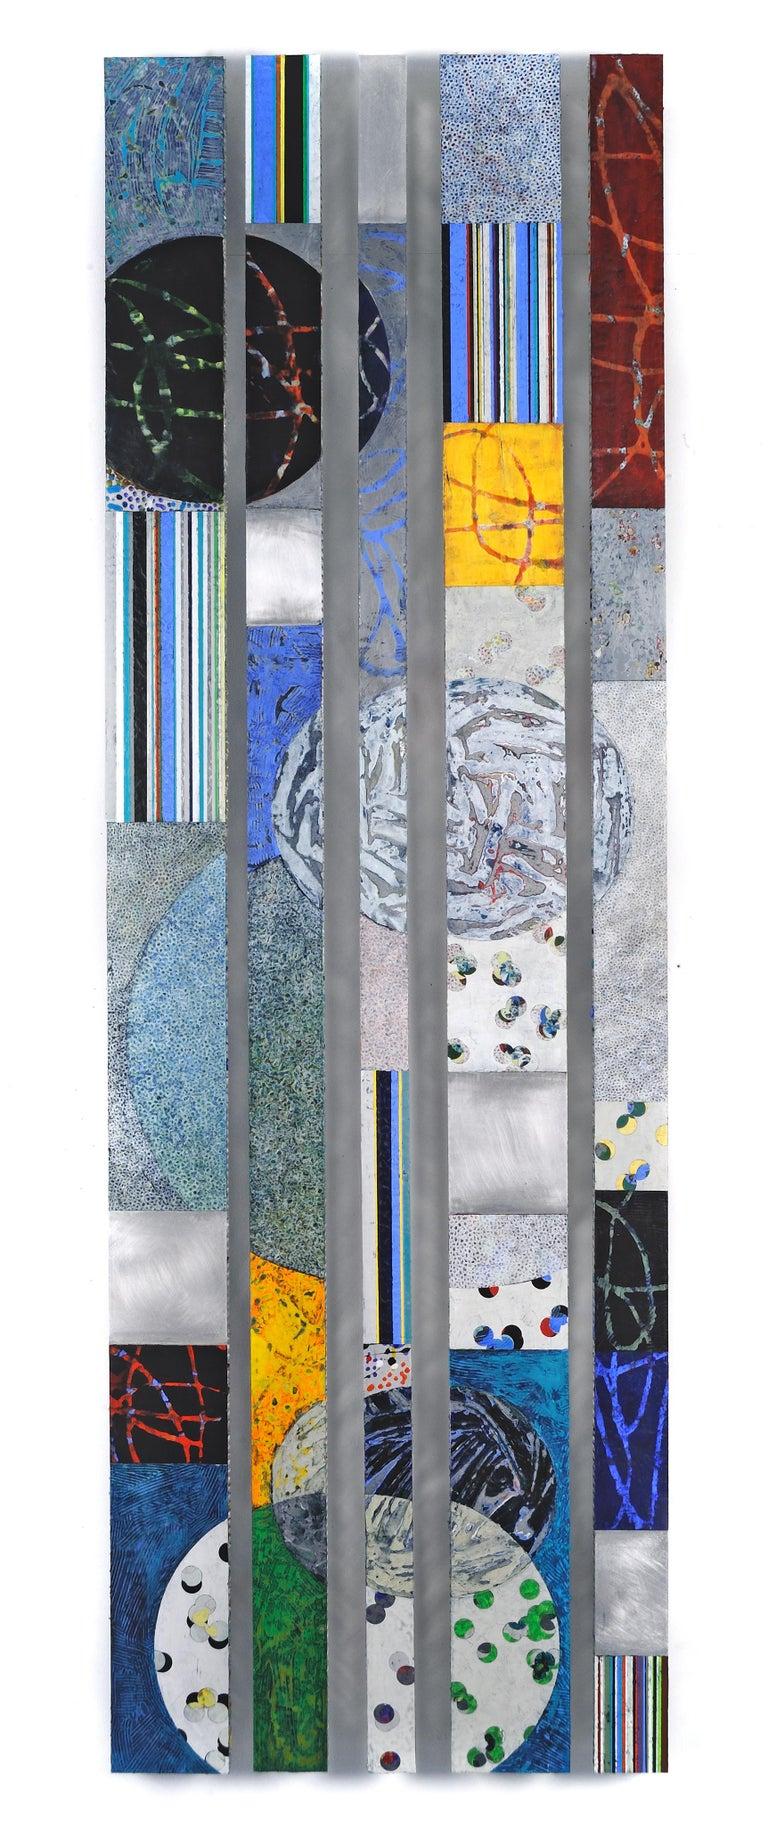 Strata 18 Set A - Mixed Media Art by Francie Hester